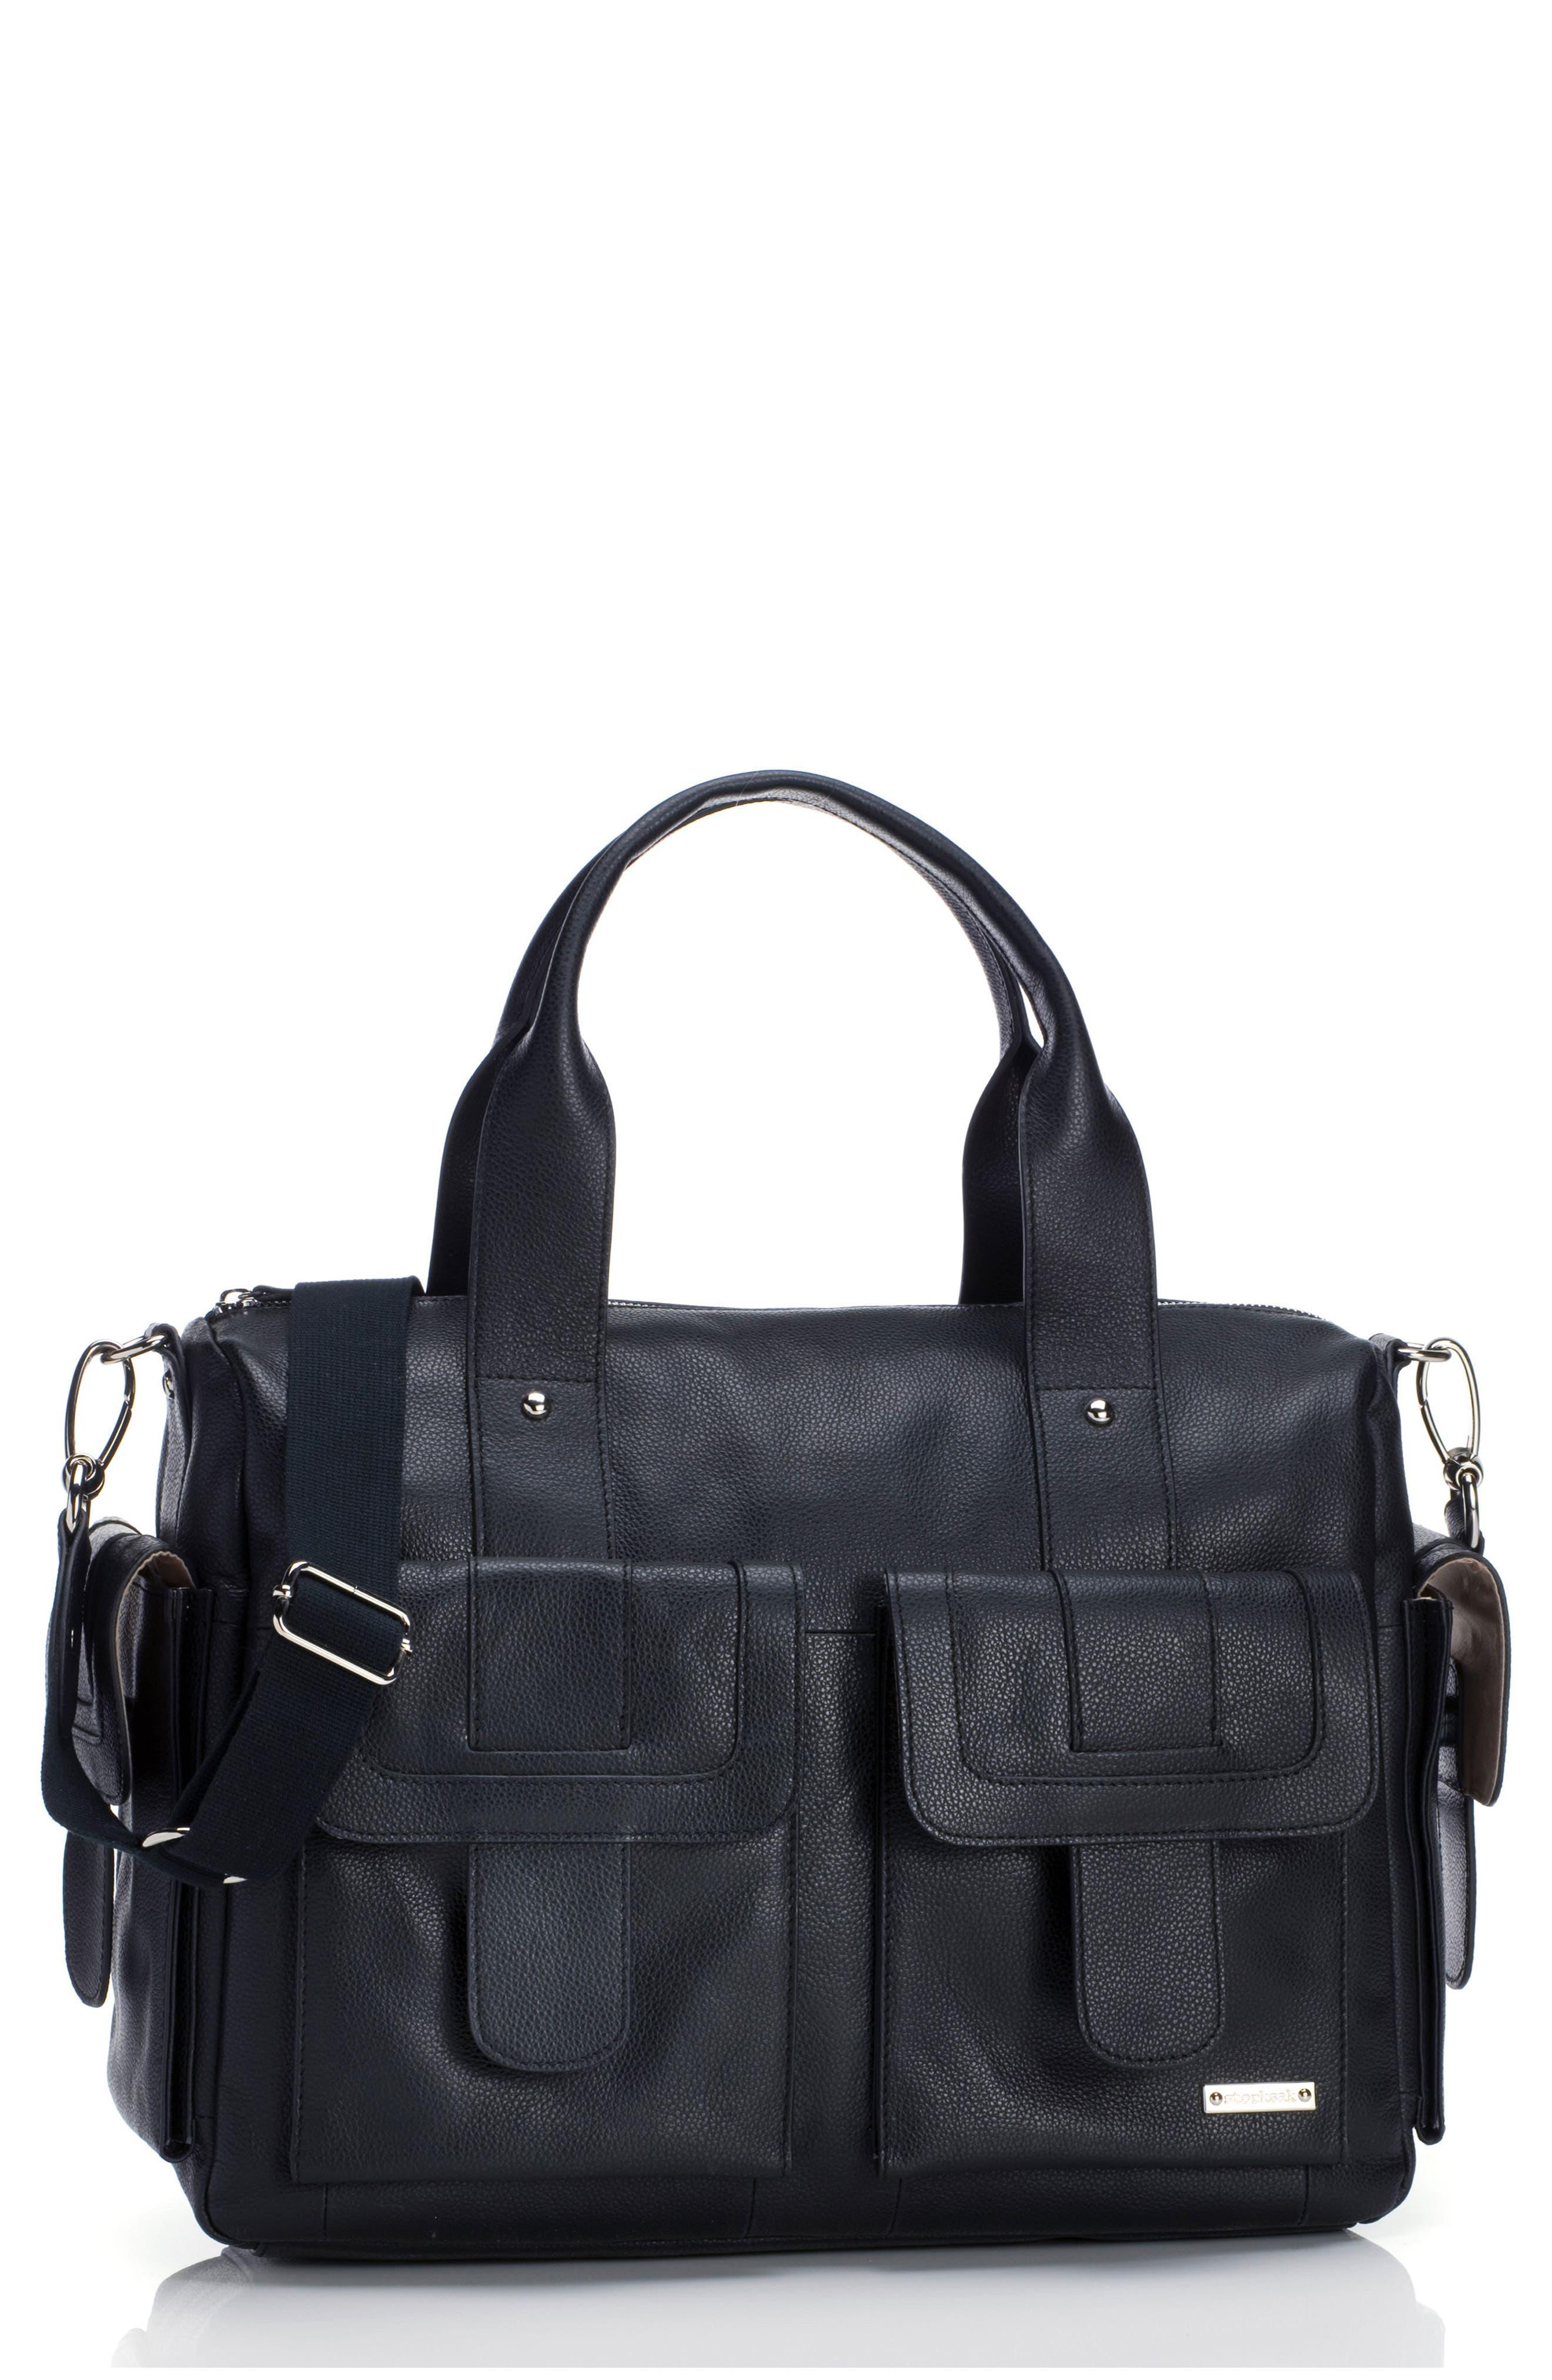 Main Image - Storsak 'Sofia' Leather Diaper Bag